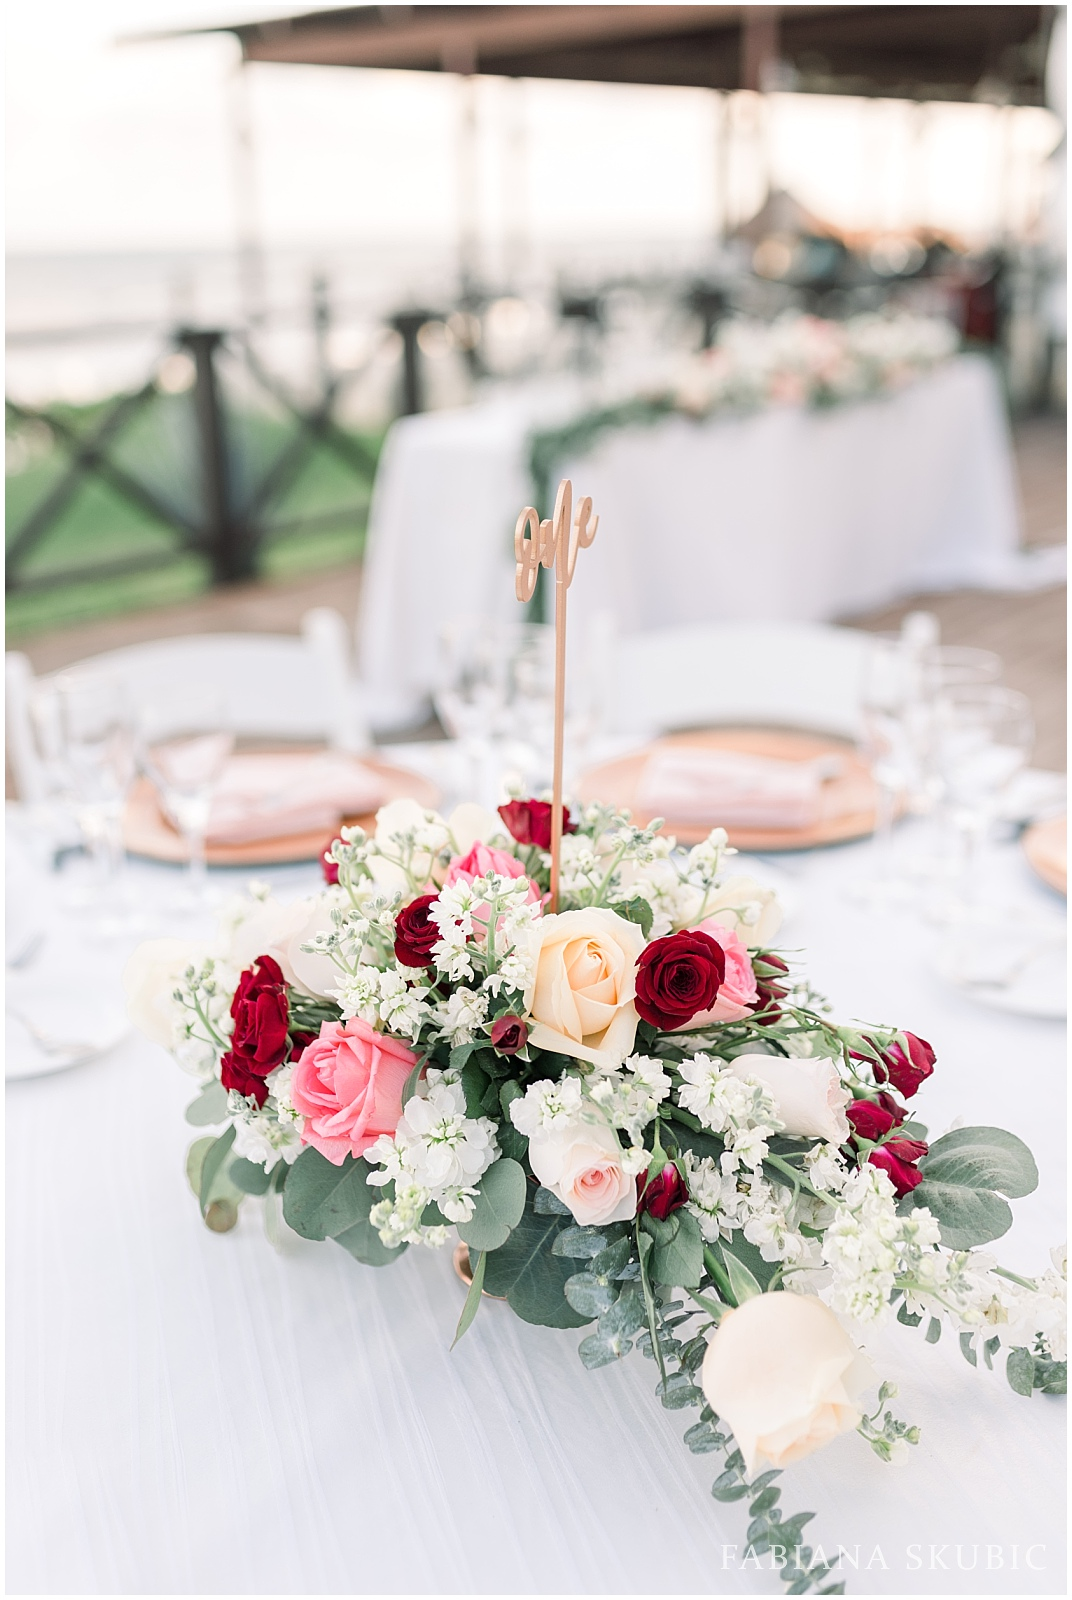 TJ_Now_Sapphire_Riviera_Cancun_Mexico_Wedding_Photos_0262.jpg